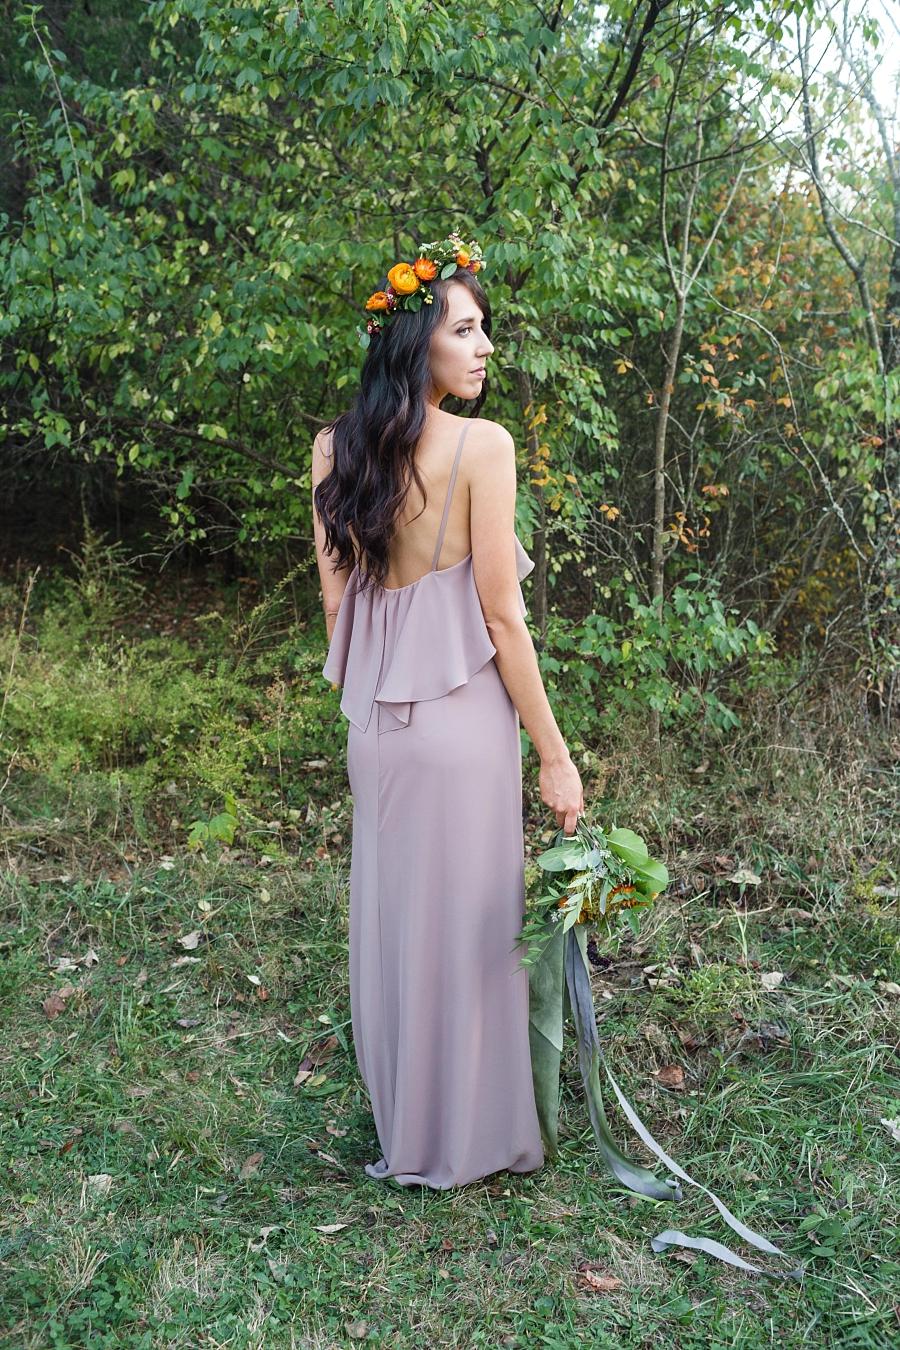 Stacy-Anderson-Photography-Cedarwood-Weddings-Nashville-Destination-Wedding-Photographer_0041.jpg